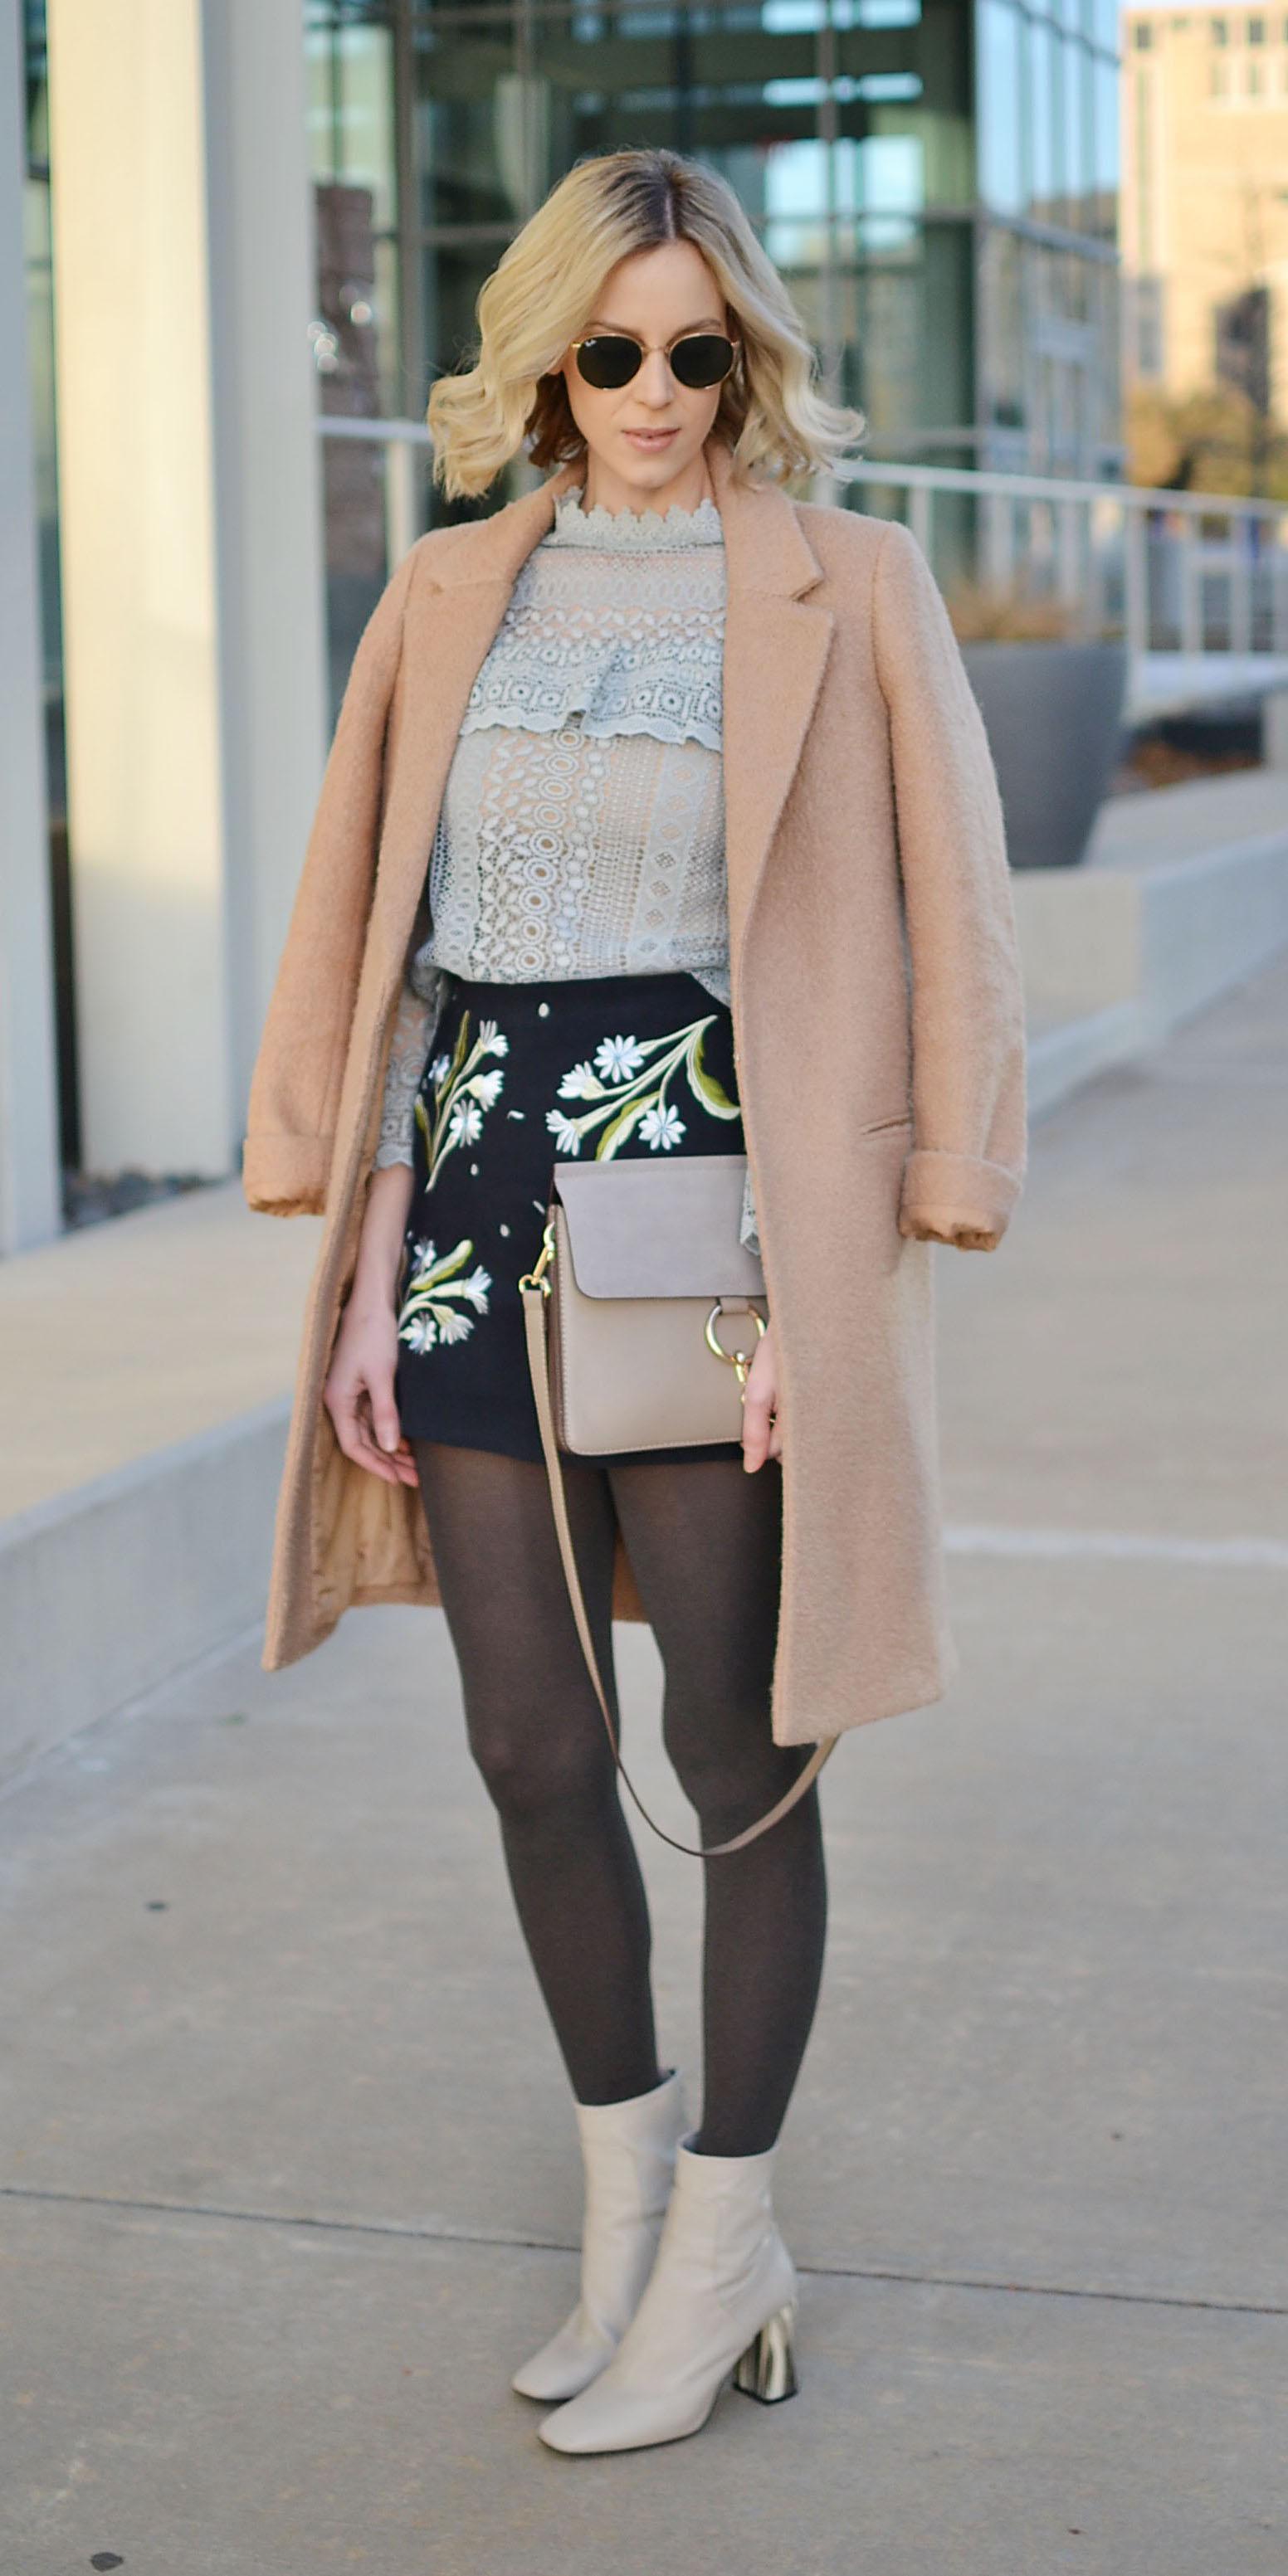 blue-navy-mini-skirt-blue-light-top-blouse-peasant-gray-tights-tan-jacket-coat-gray-shoe-booties-blonde-lob-gray-bag-fall-winter-lunch.jpg